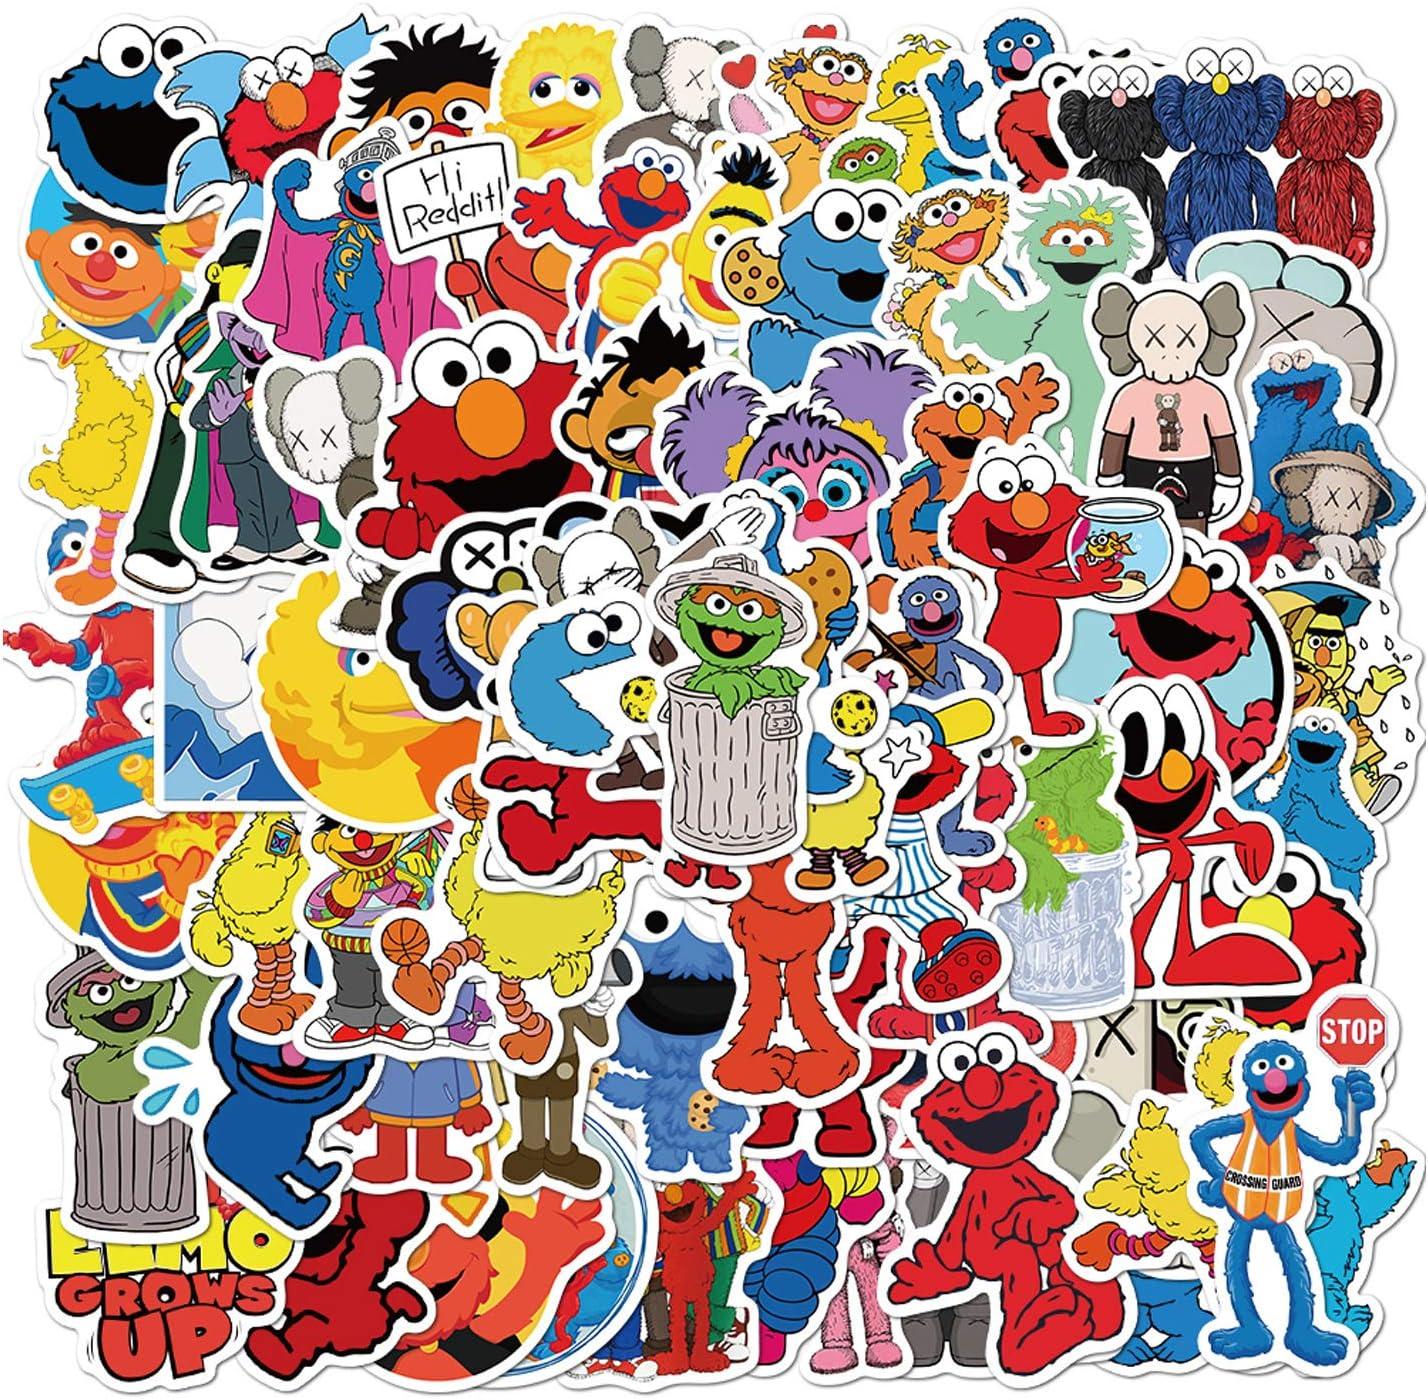 100PCS Sesam_e Street Stickers Elmo Stickers Waterproof Vinyl Stickers for Toddlers Kids Teens Adults Water Bottle House Skateboard